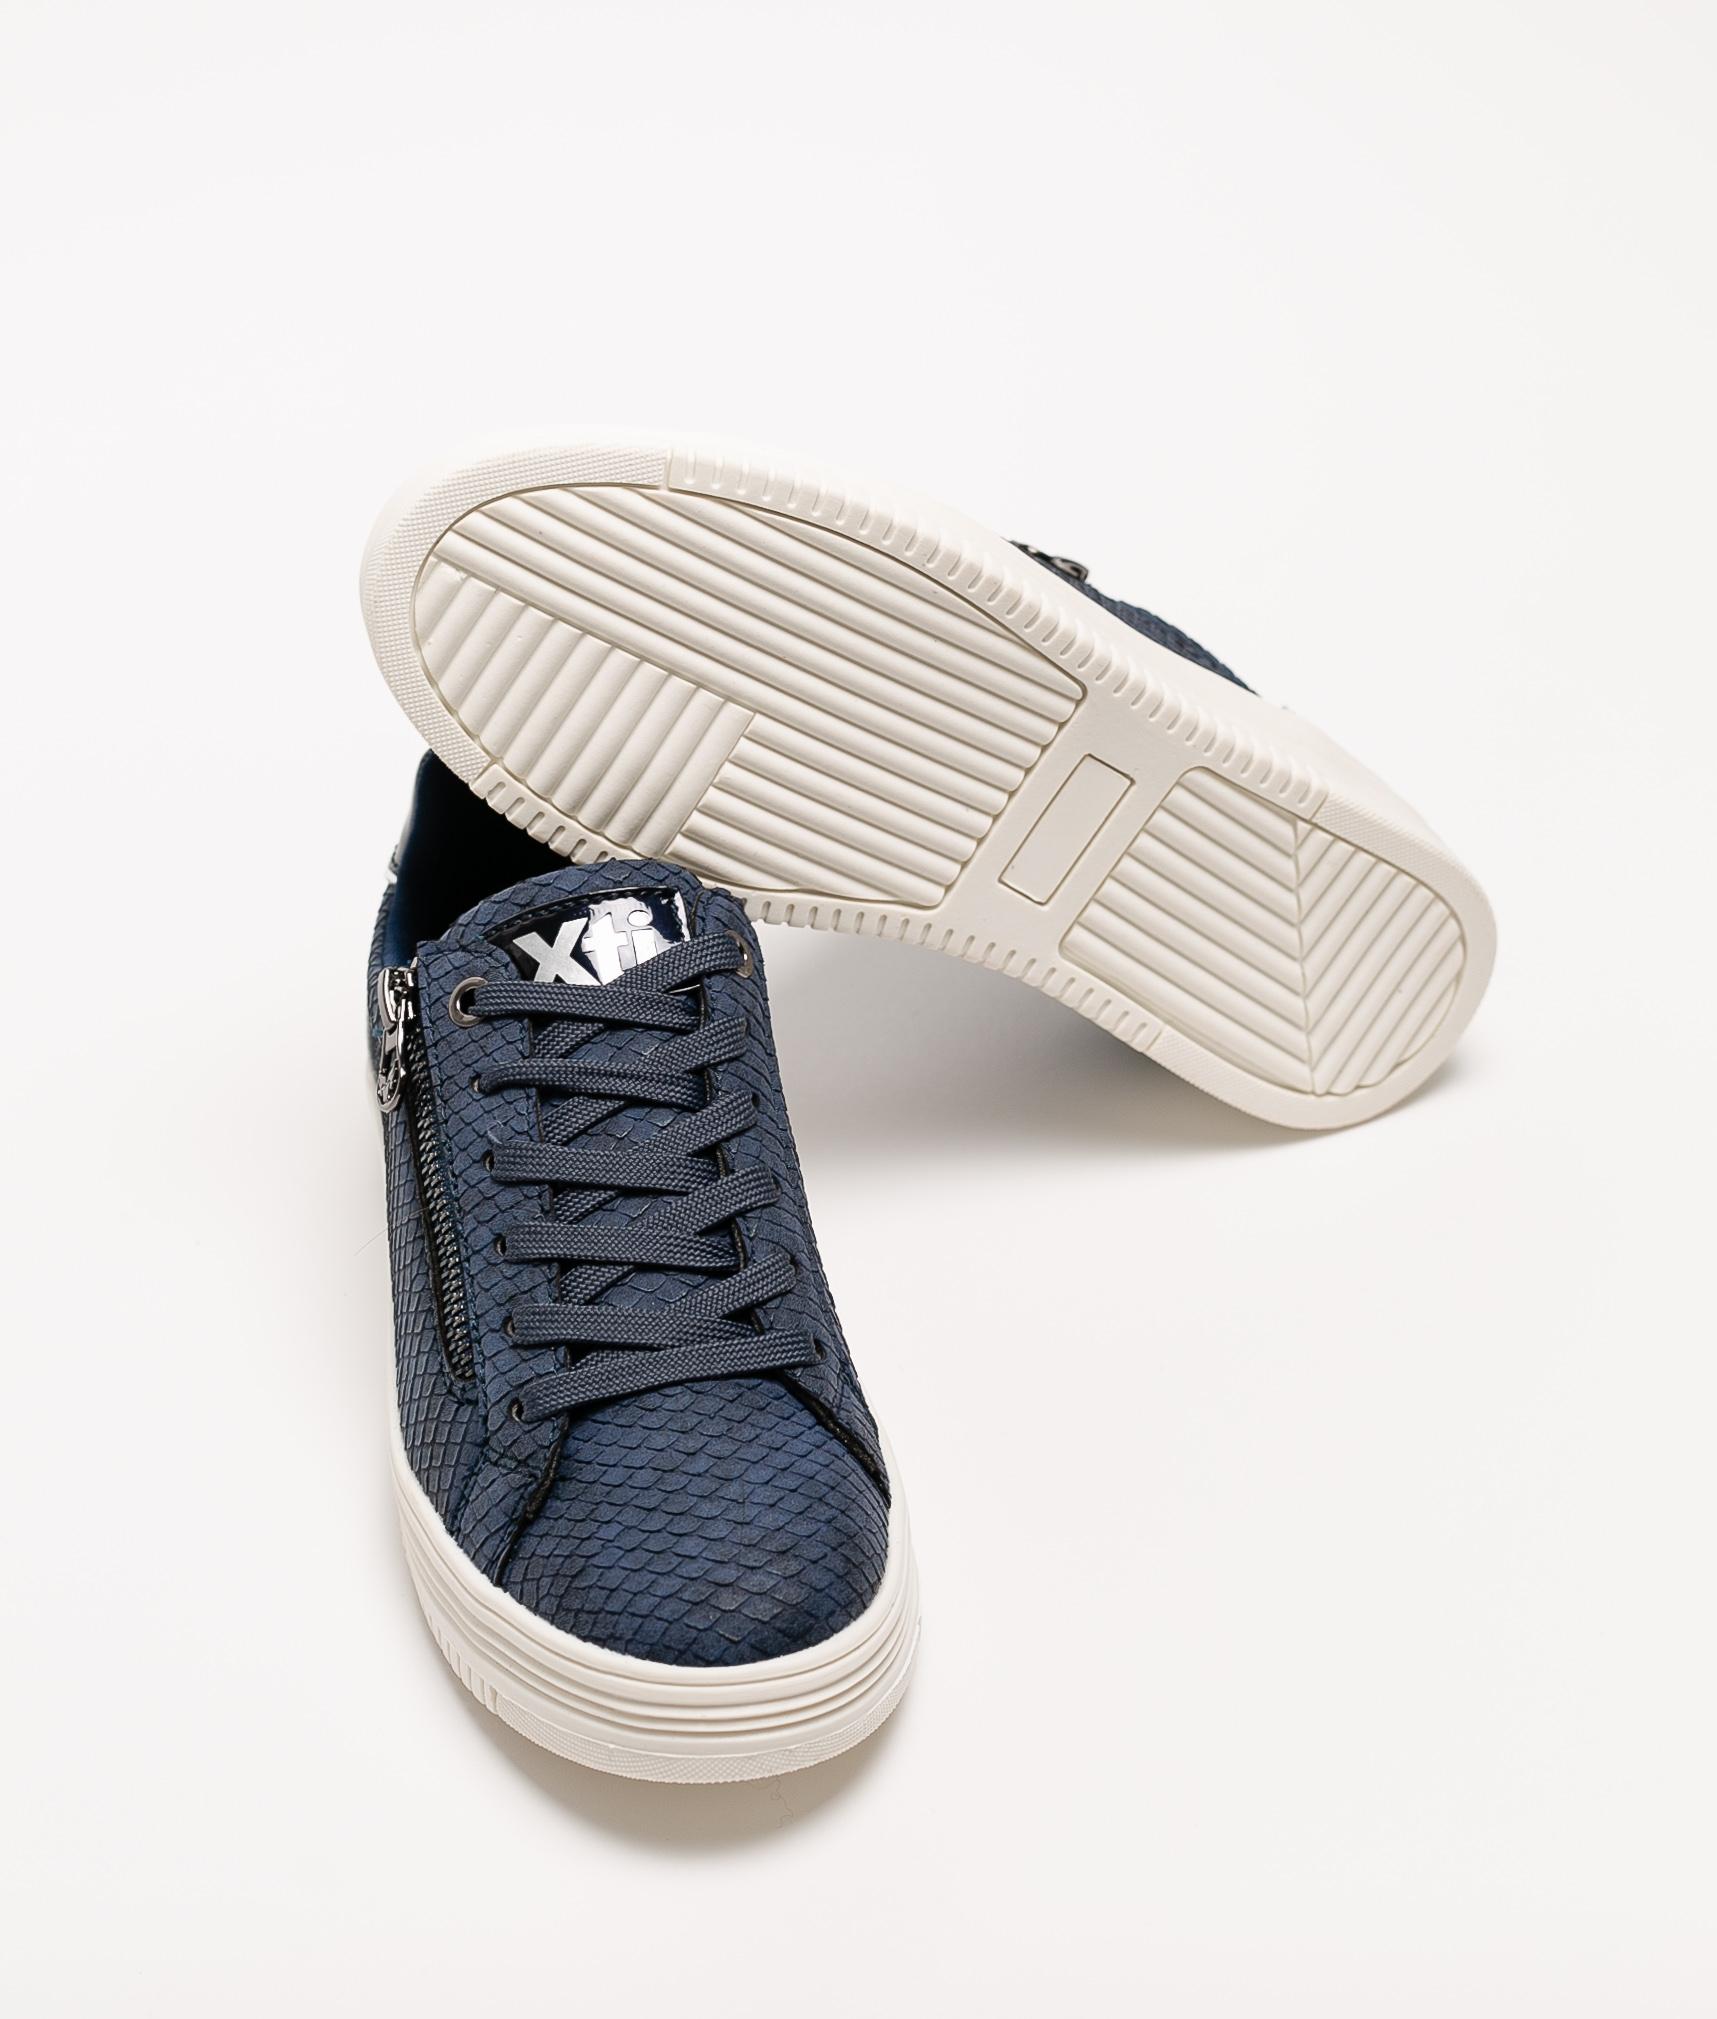 Sneakers Soule Xti - Azul